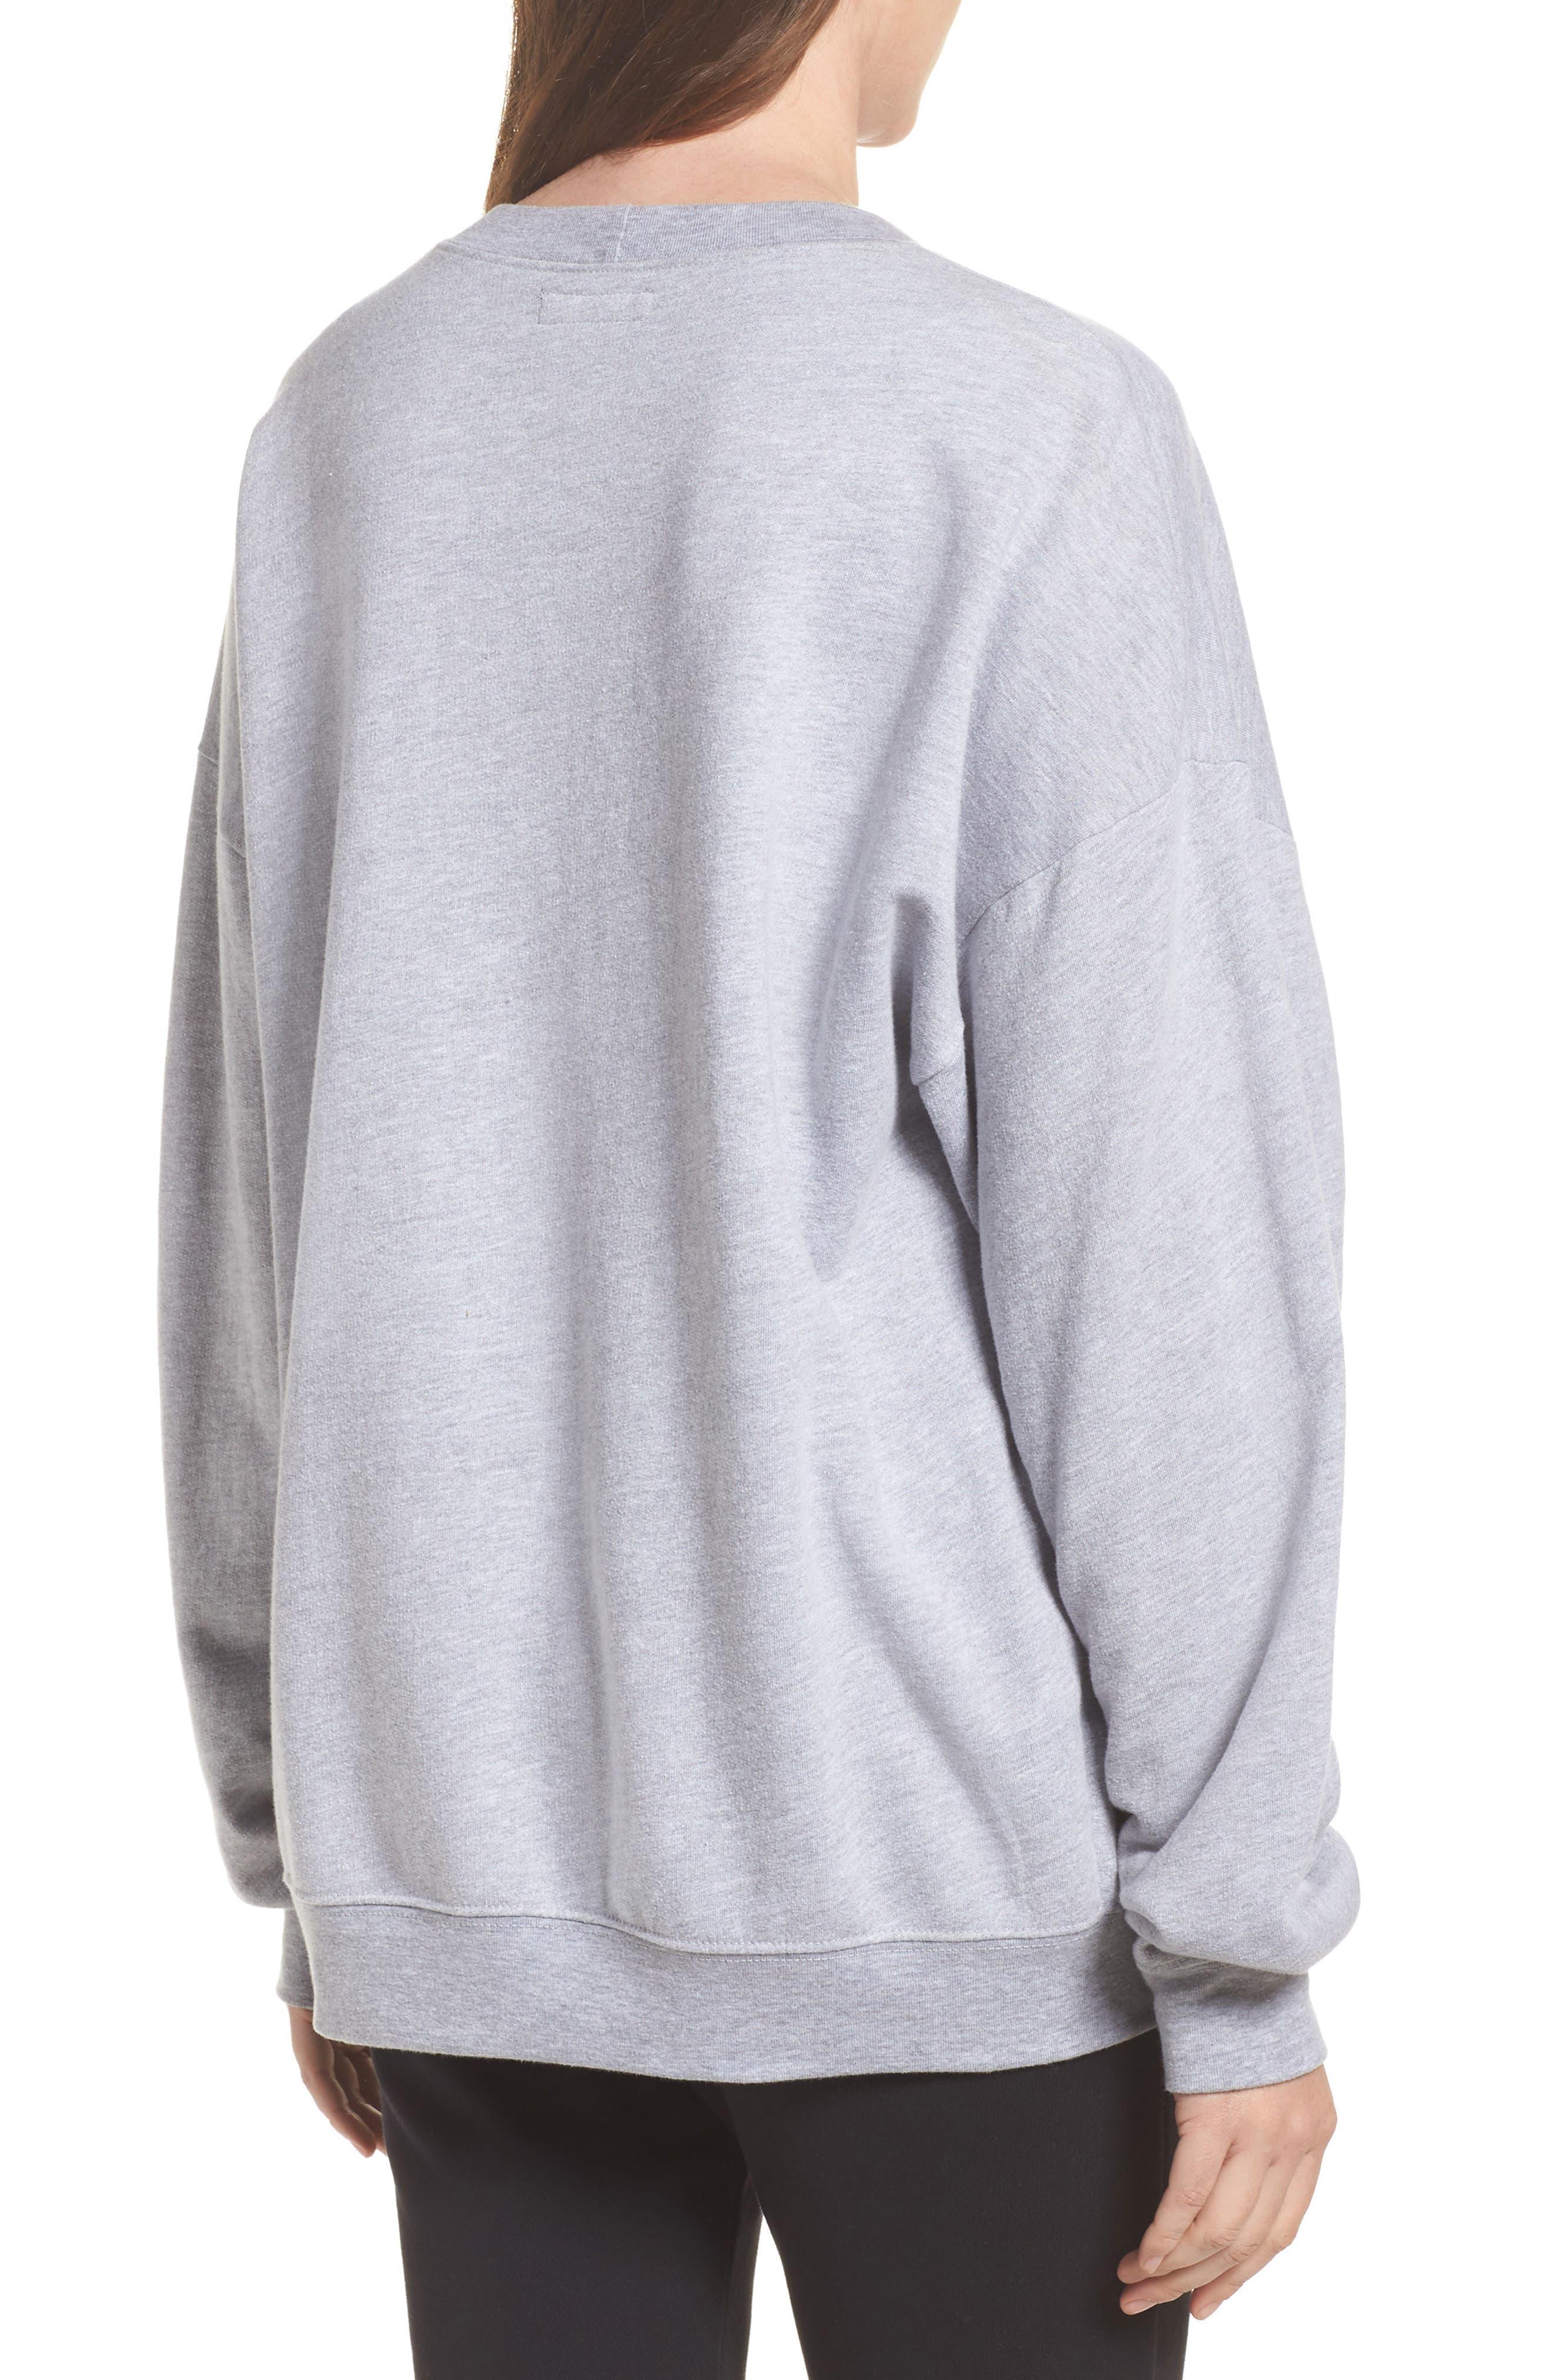 Ellstan Oversize Boyfriend Sweatshirt,                             Alternate thumbnail 2, color,                             035